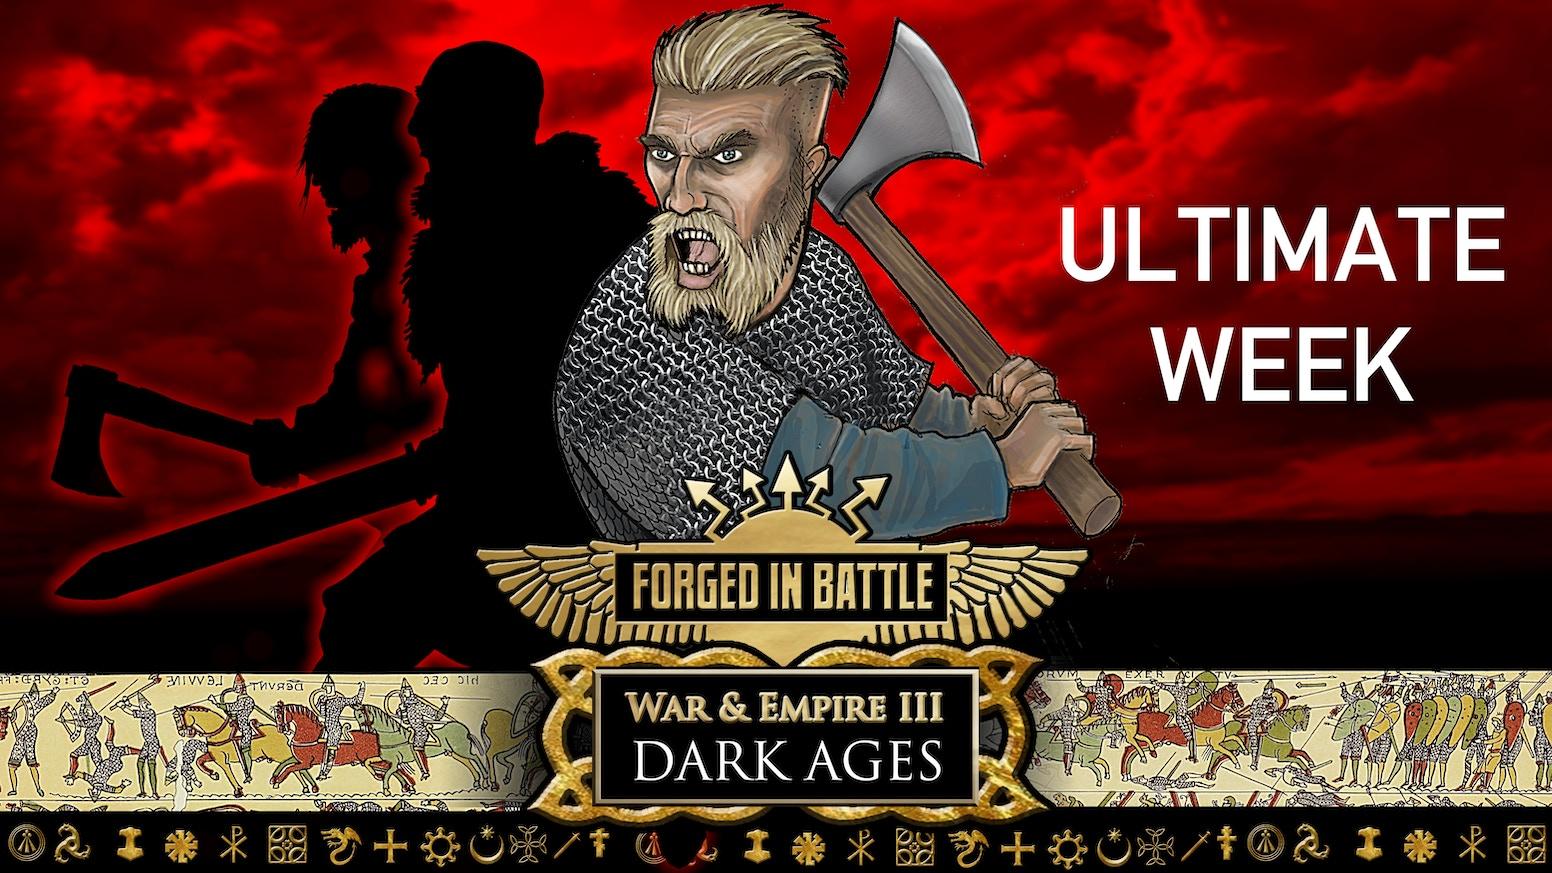 War Empire Iii Dark Ages By Andy Cooper West Wind Productions Lanccelot Watch Aegis Of Attilia Updates Kickstarter